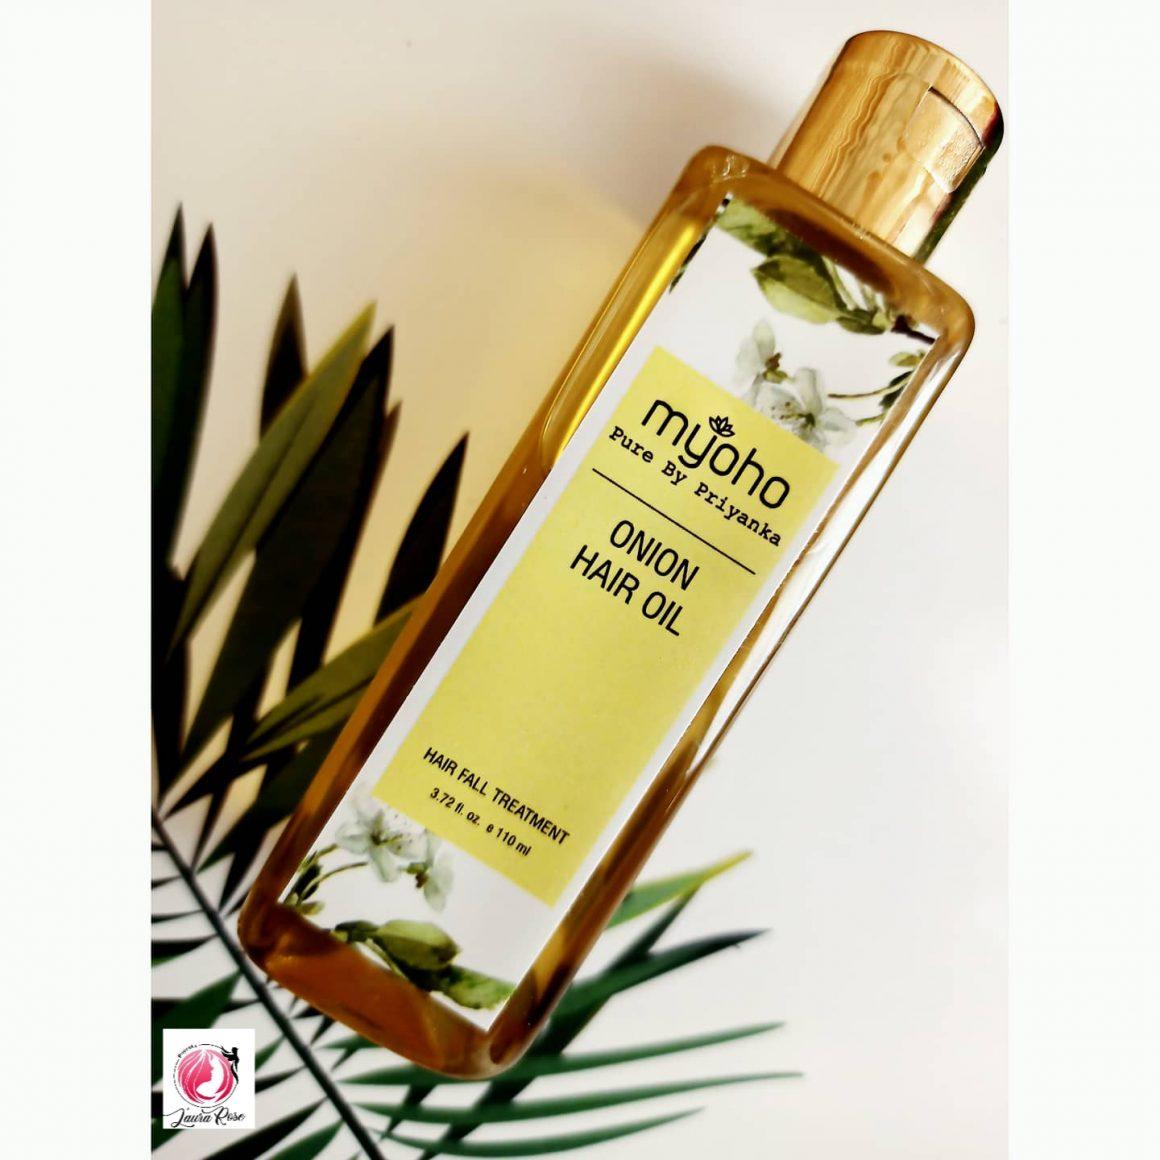 Pure By Priyanka Onion Hair Oil